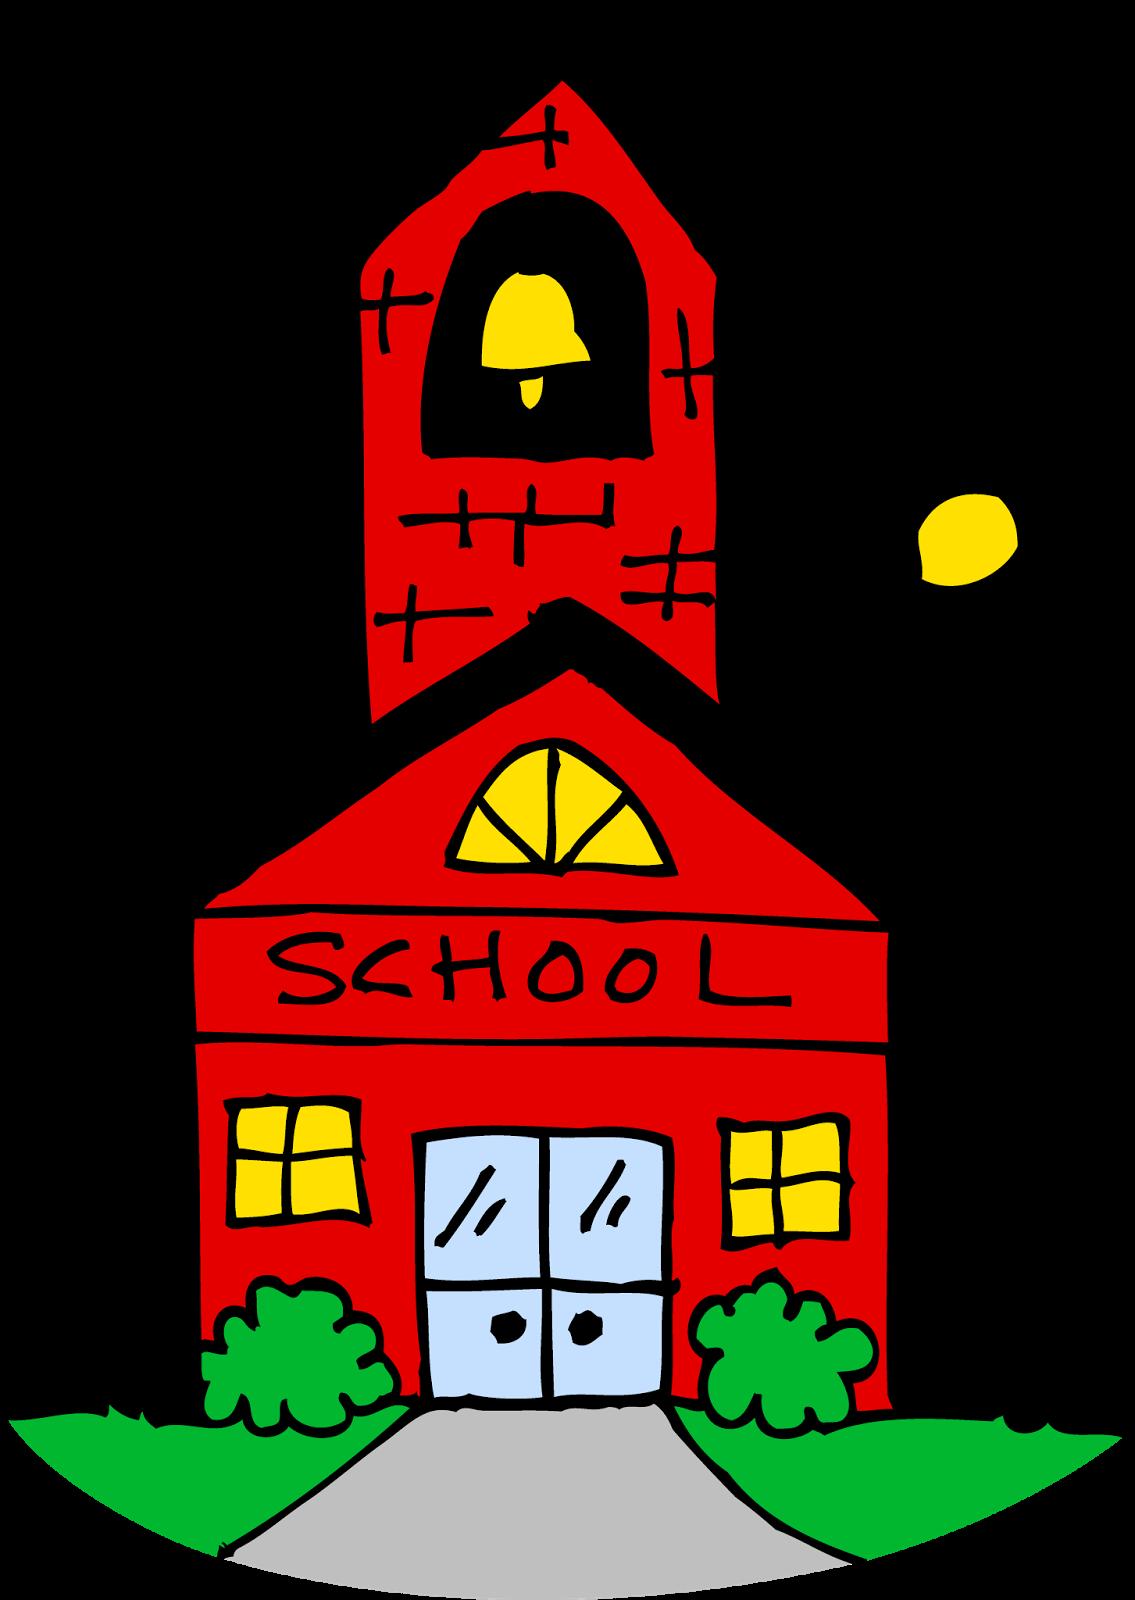 Schoolhouse school time